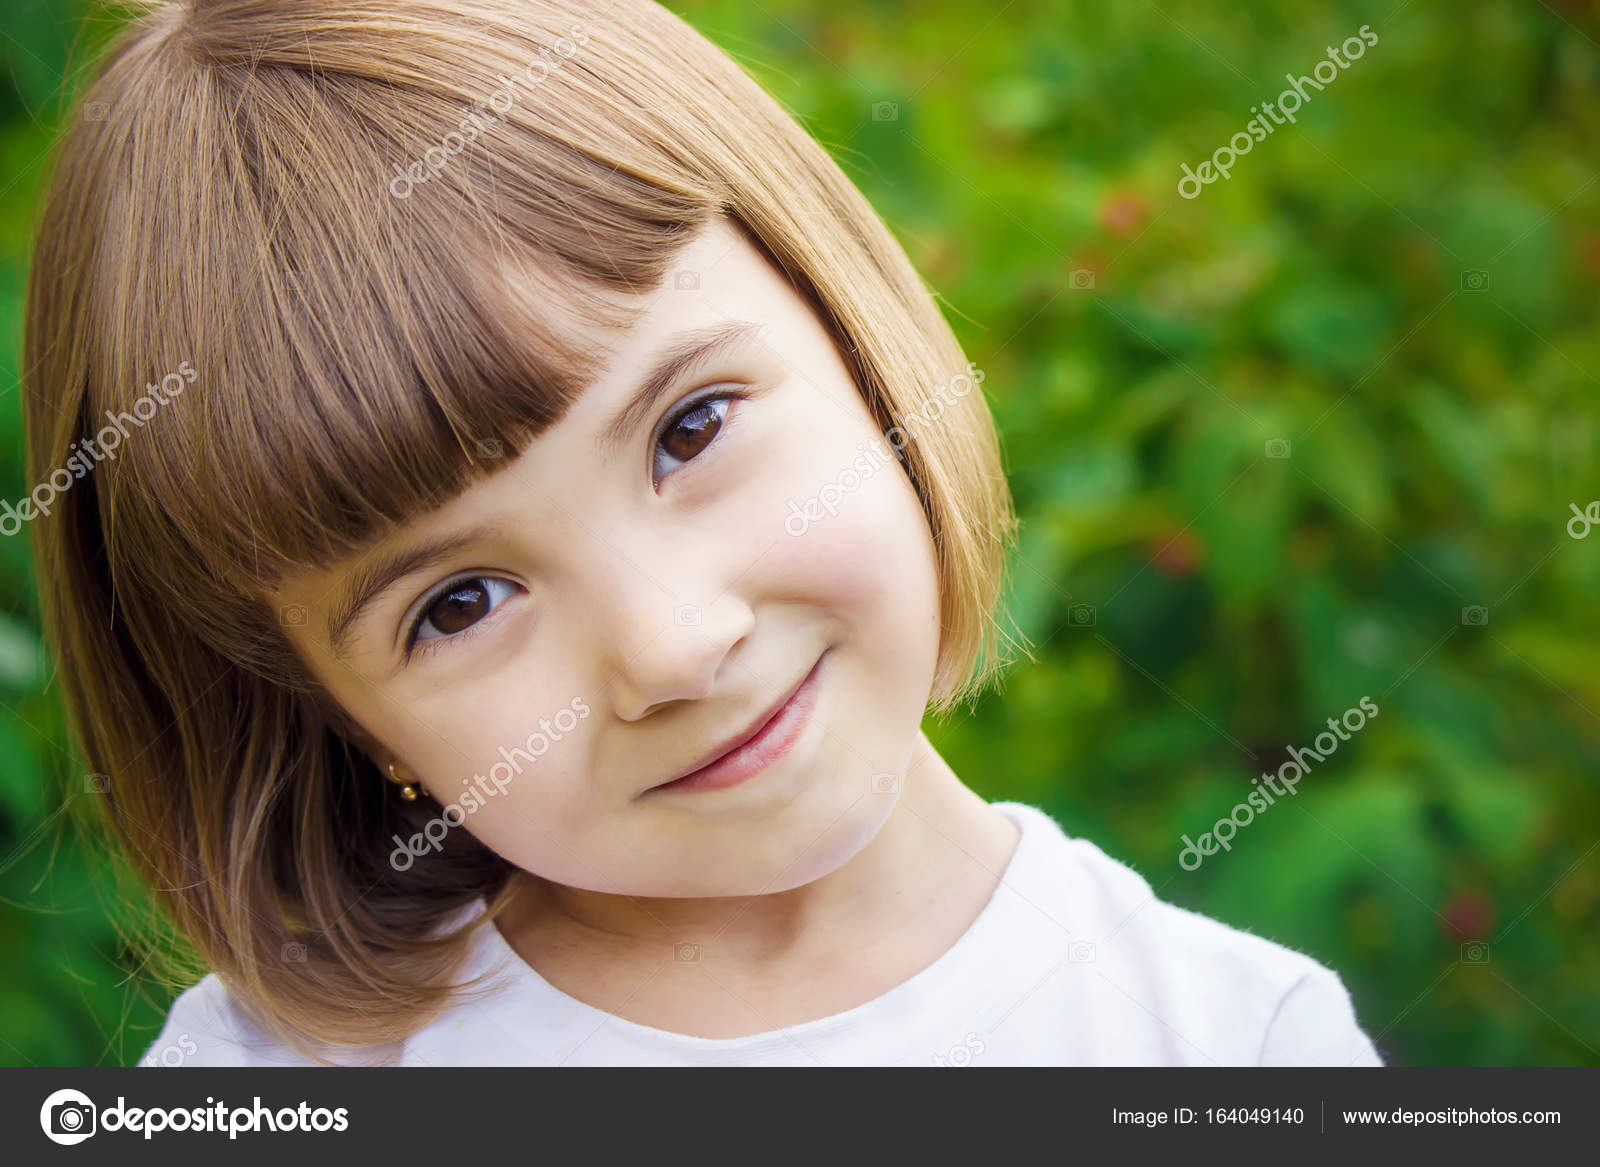 Baby Haircut Selective Focus Stock Photo C Yana Komisarenko